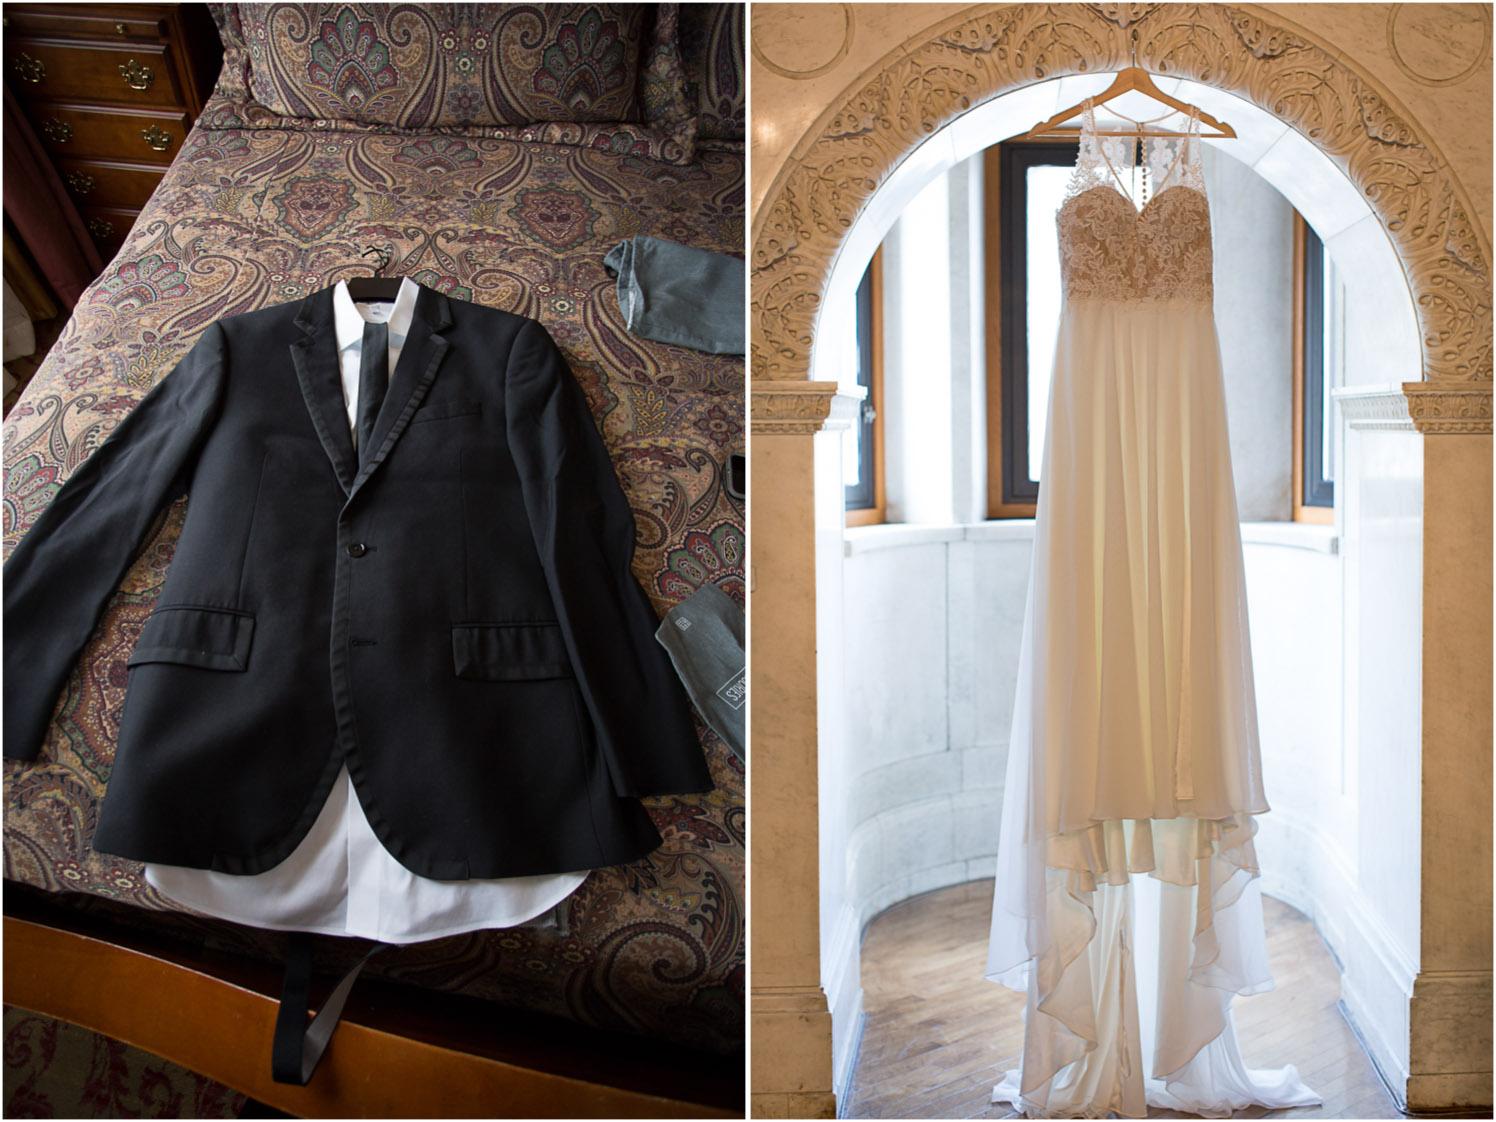 01-the-landmark-center-st-paul-minnesota-wedding-photographer-bride-groom-details-tux-lacy-dress-mahonen-photography.jpg